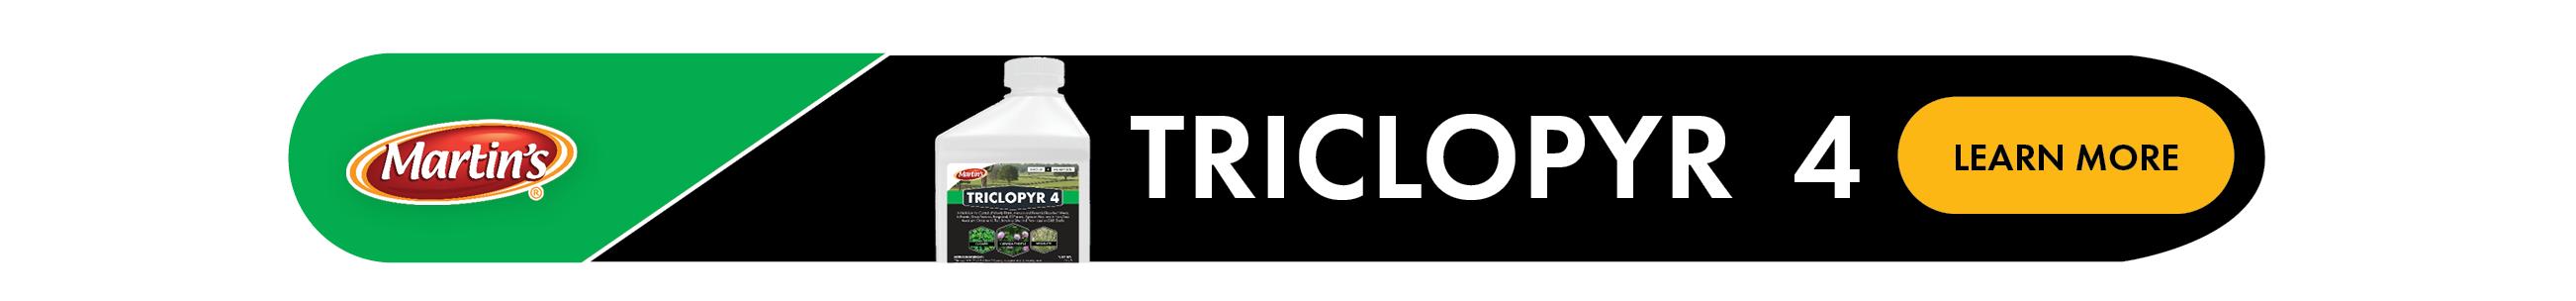 Triclopyr 4 CTA